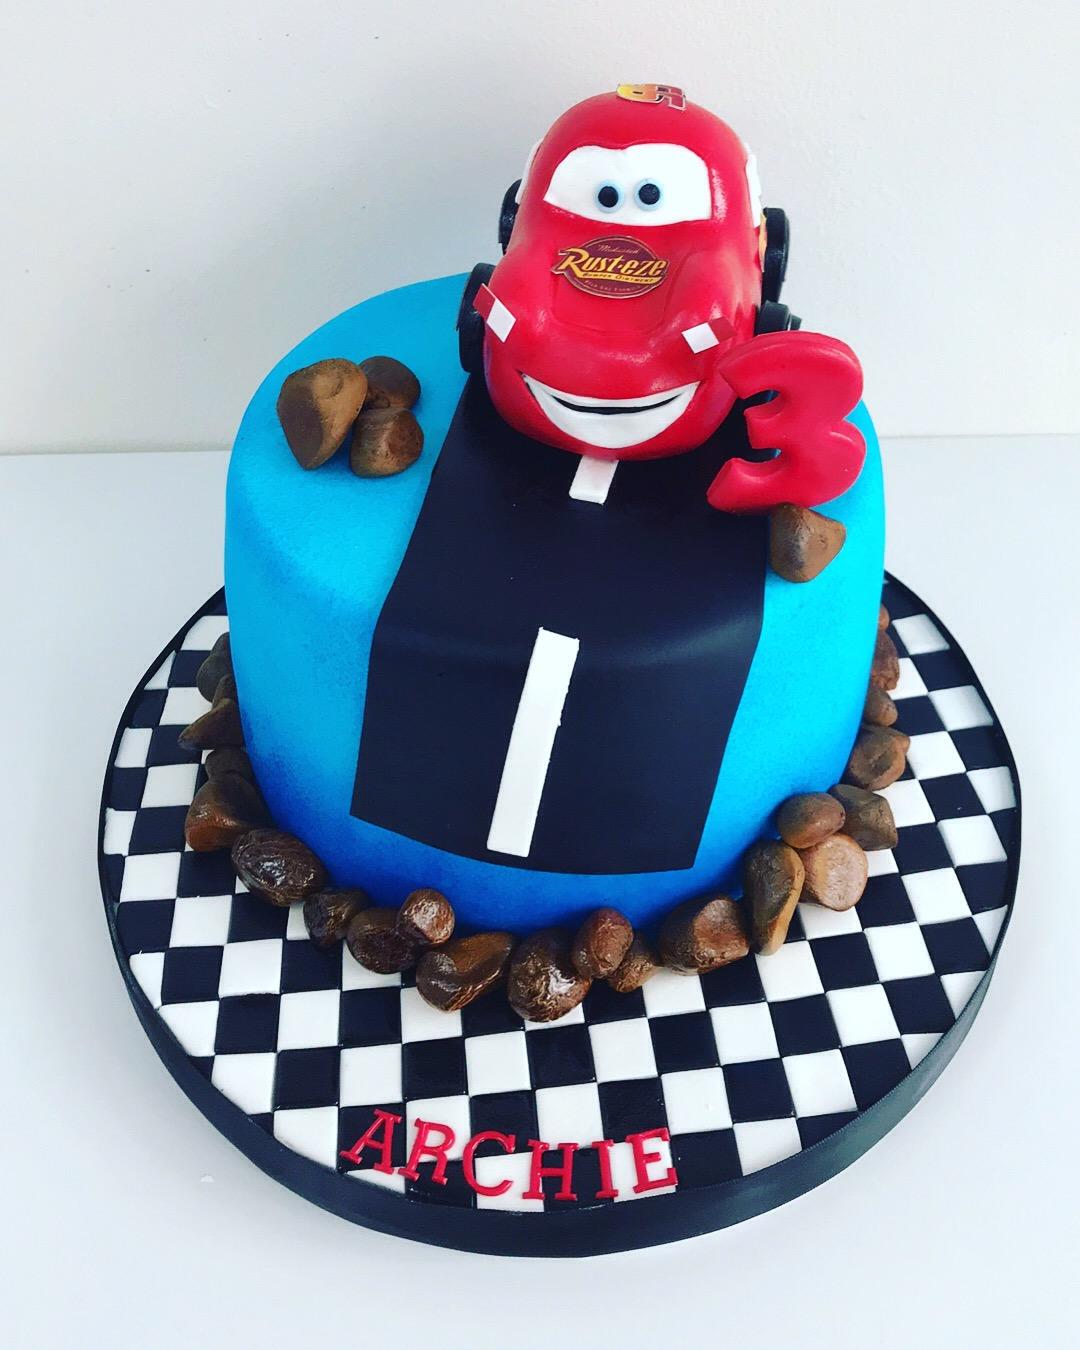 Prime Disney Cars Childrens Birthday Cake Luscious Lovelies Cakes Funny Birthday Cards Online Alyptdamsfinfo